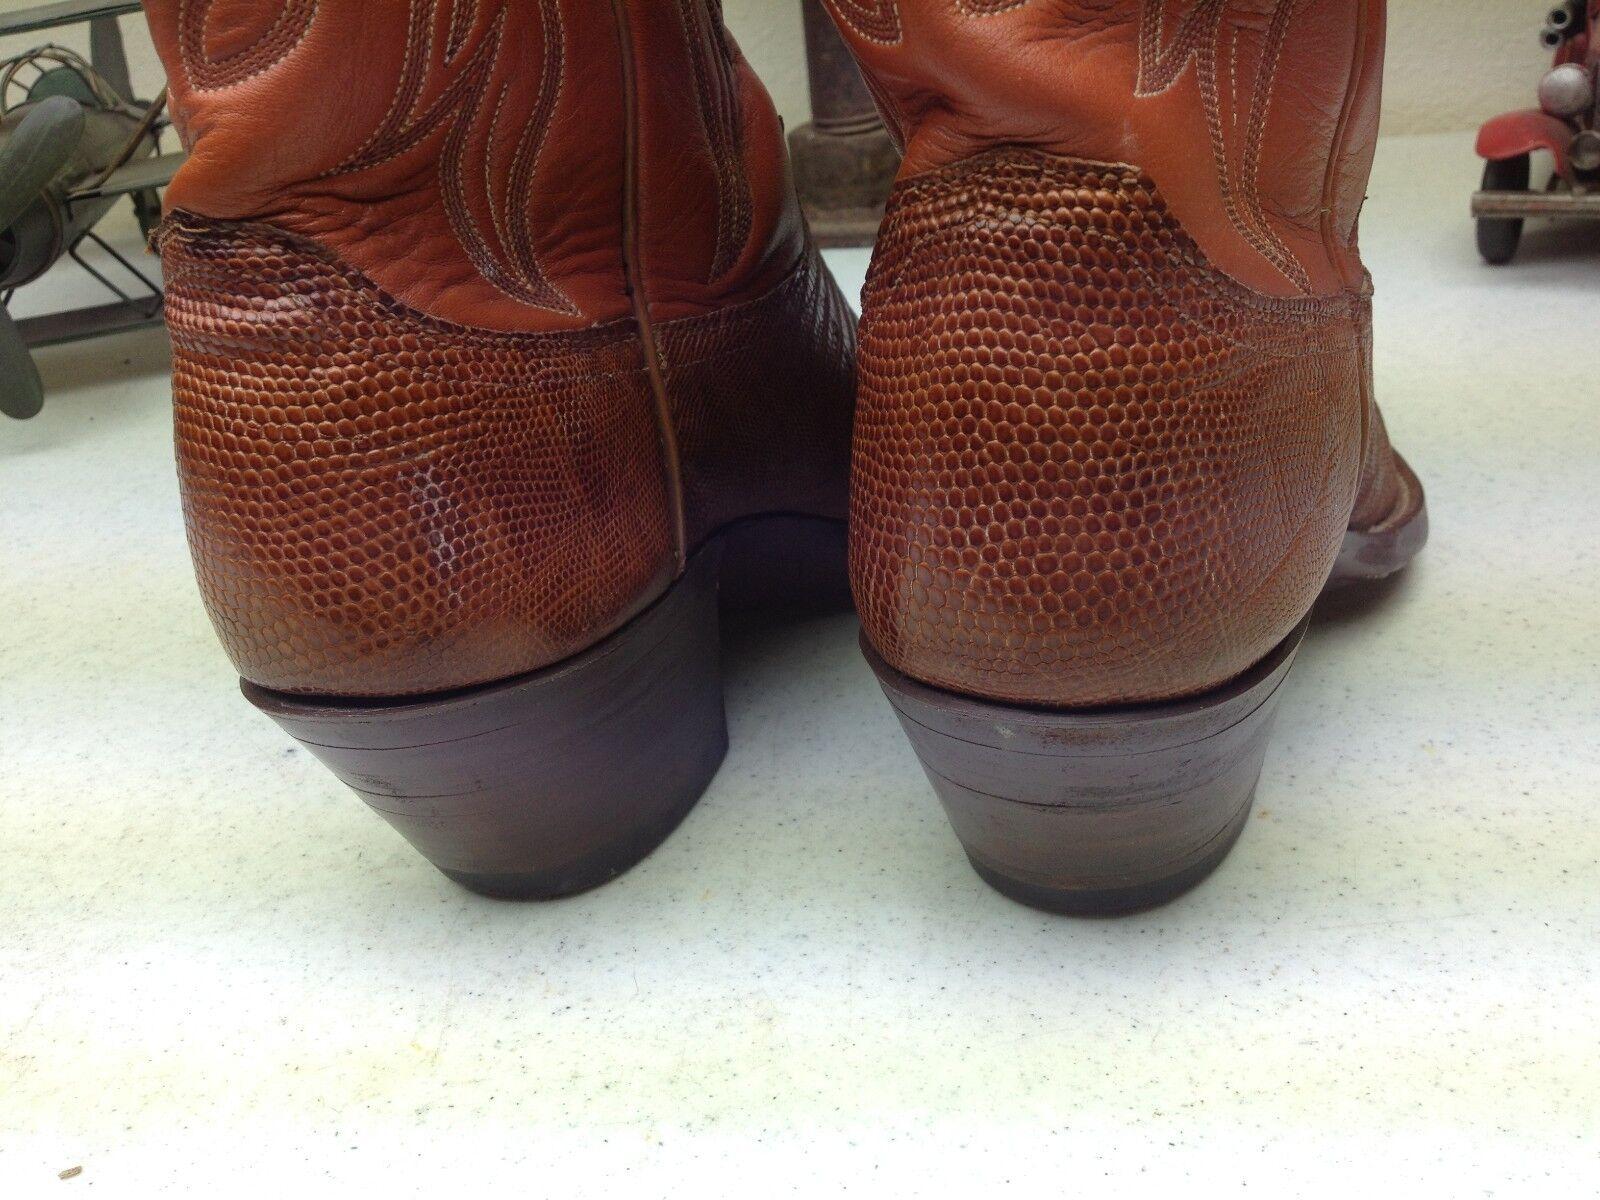 CLASSIC JUSTIN STYLE 7322 COGNAC LEATHER LIZARD WESTERN WESTERN WESTERN COWBOY DANCE BOOTS 8.5D 27922b